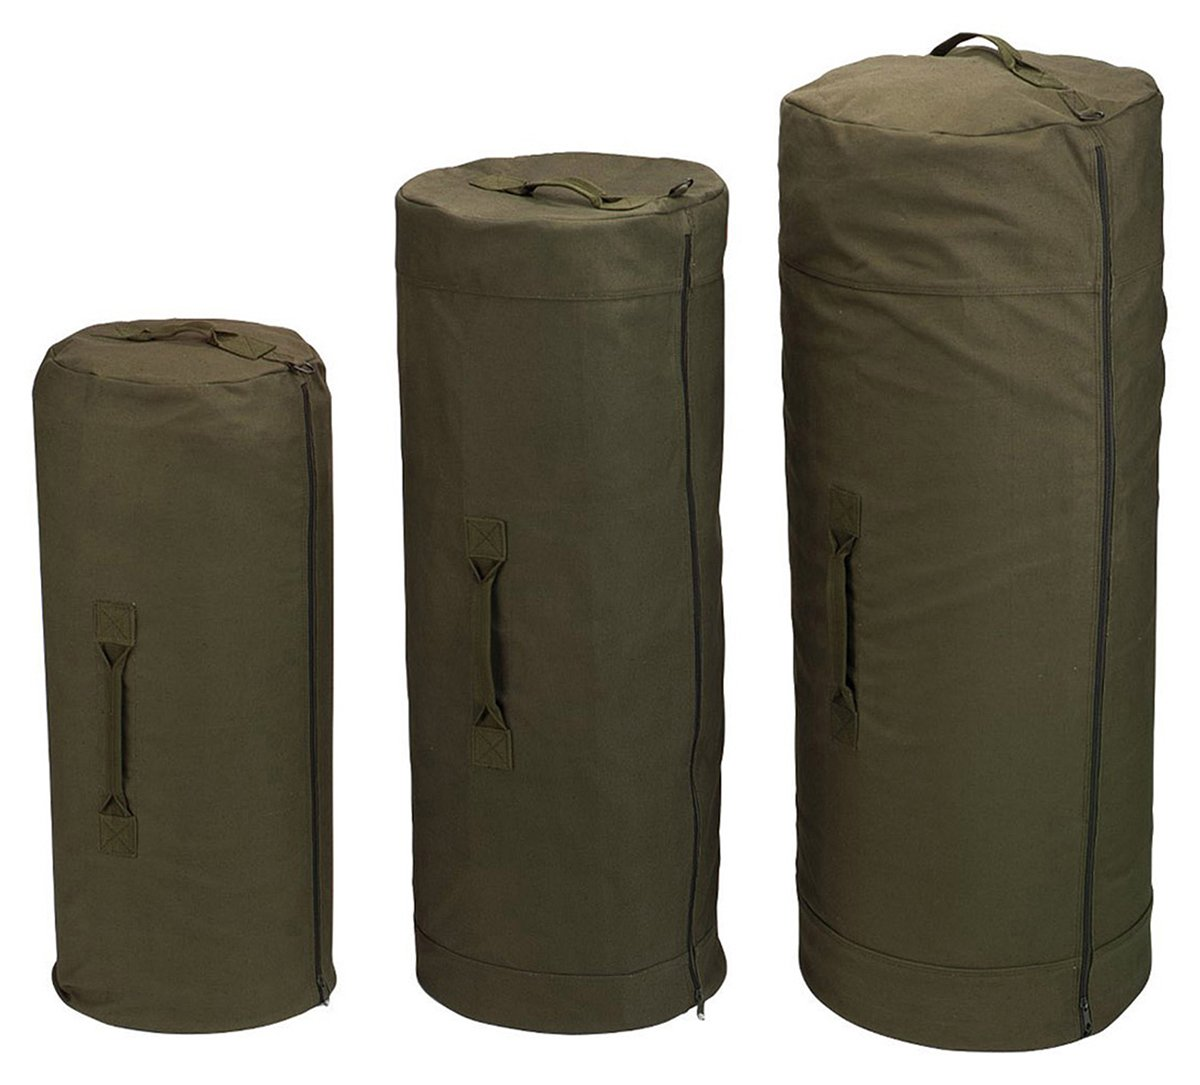 Rothco Canvas Zipper Duffle Bag 613902347809